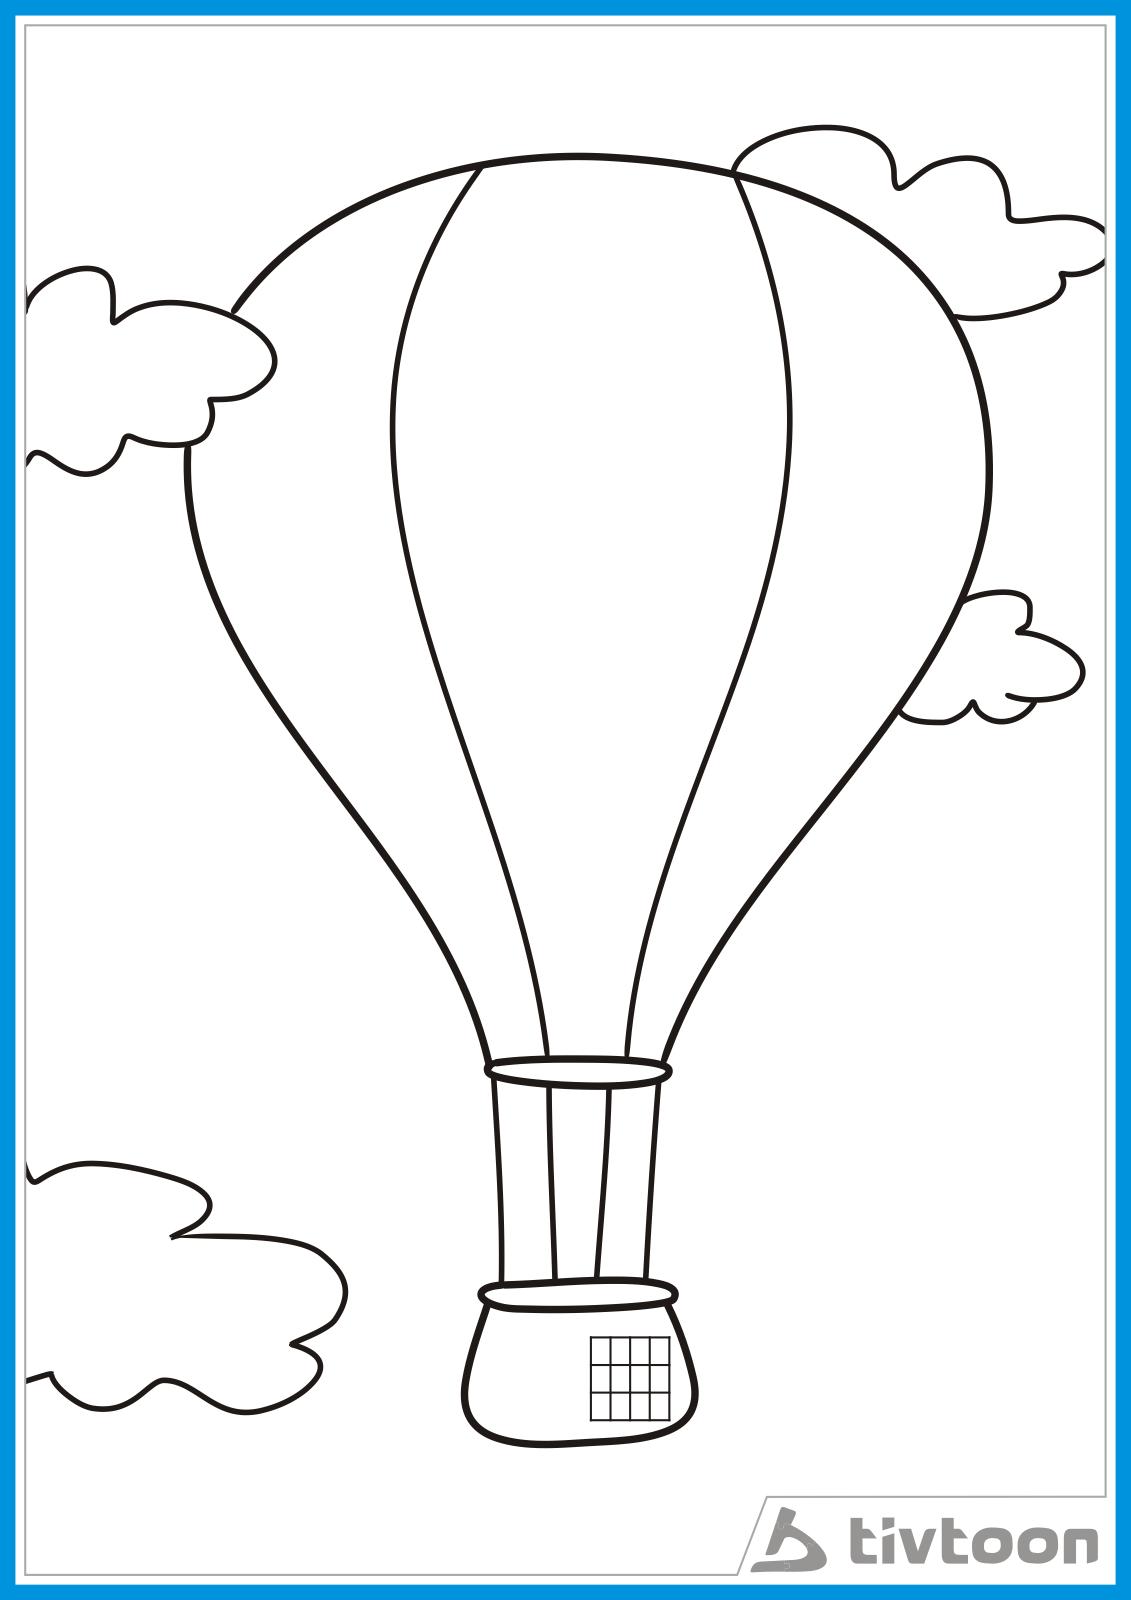 Gambar Sketsa Balon : gambar, sketsa, balon, Populer, Sketsa, Pemandangan, Balon,, Gambar